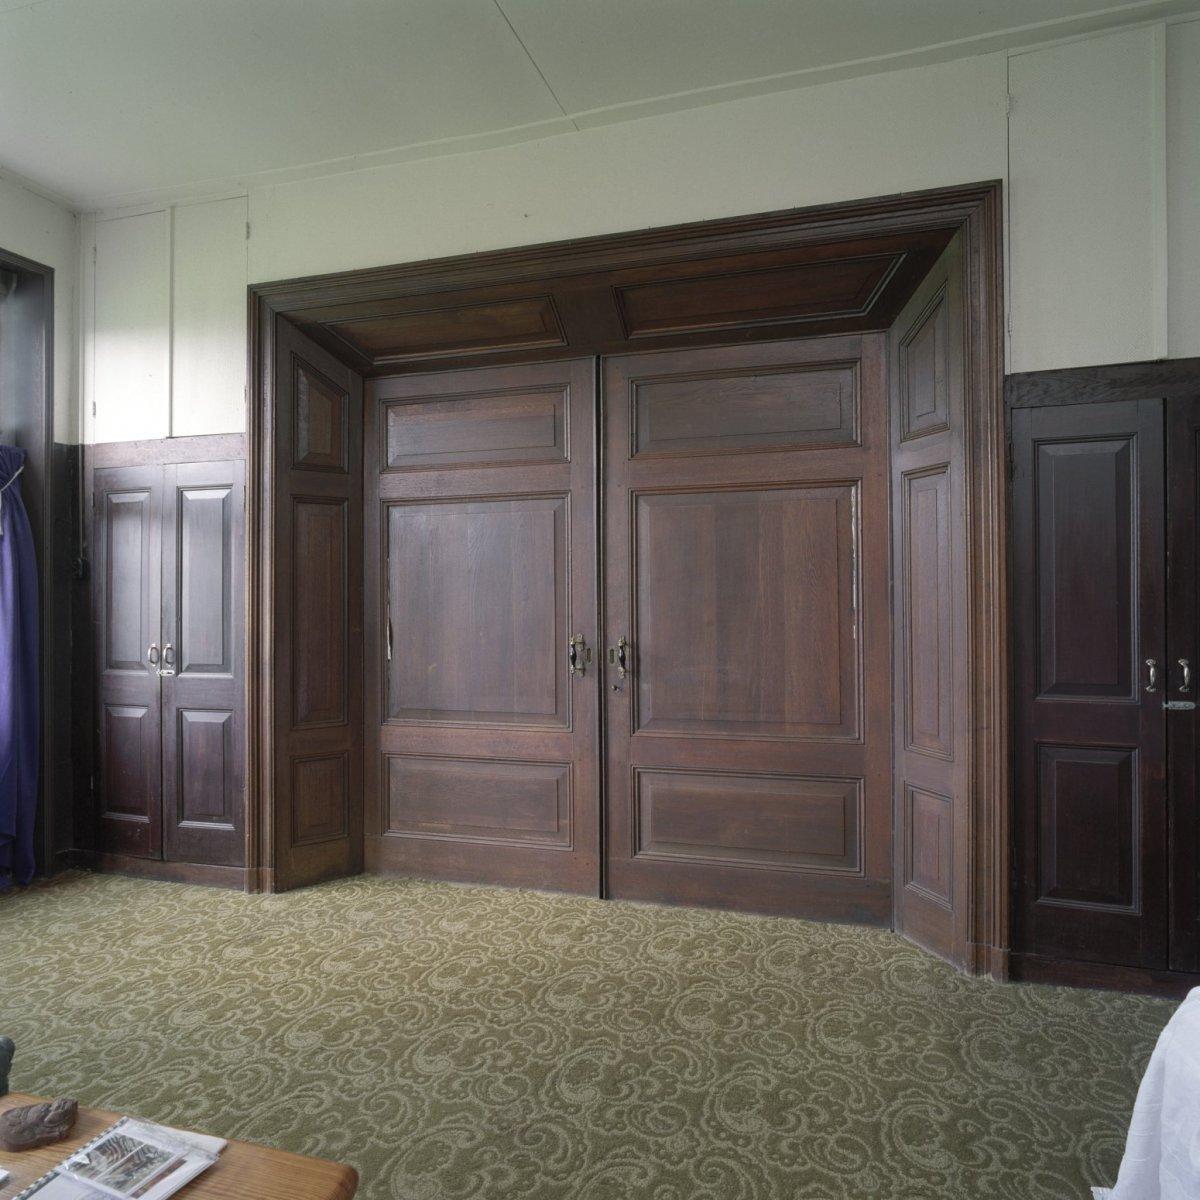 File:Interieur woonhuis, dubbele deuren in de woonkamer ...